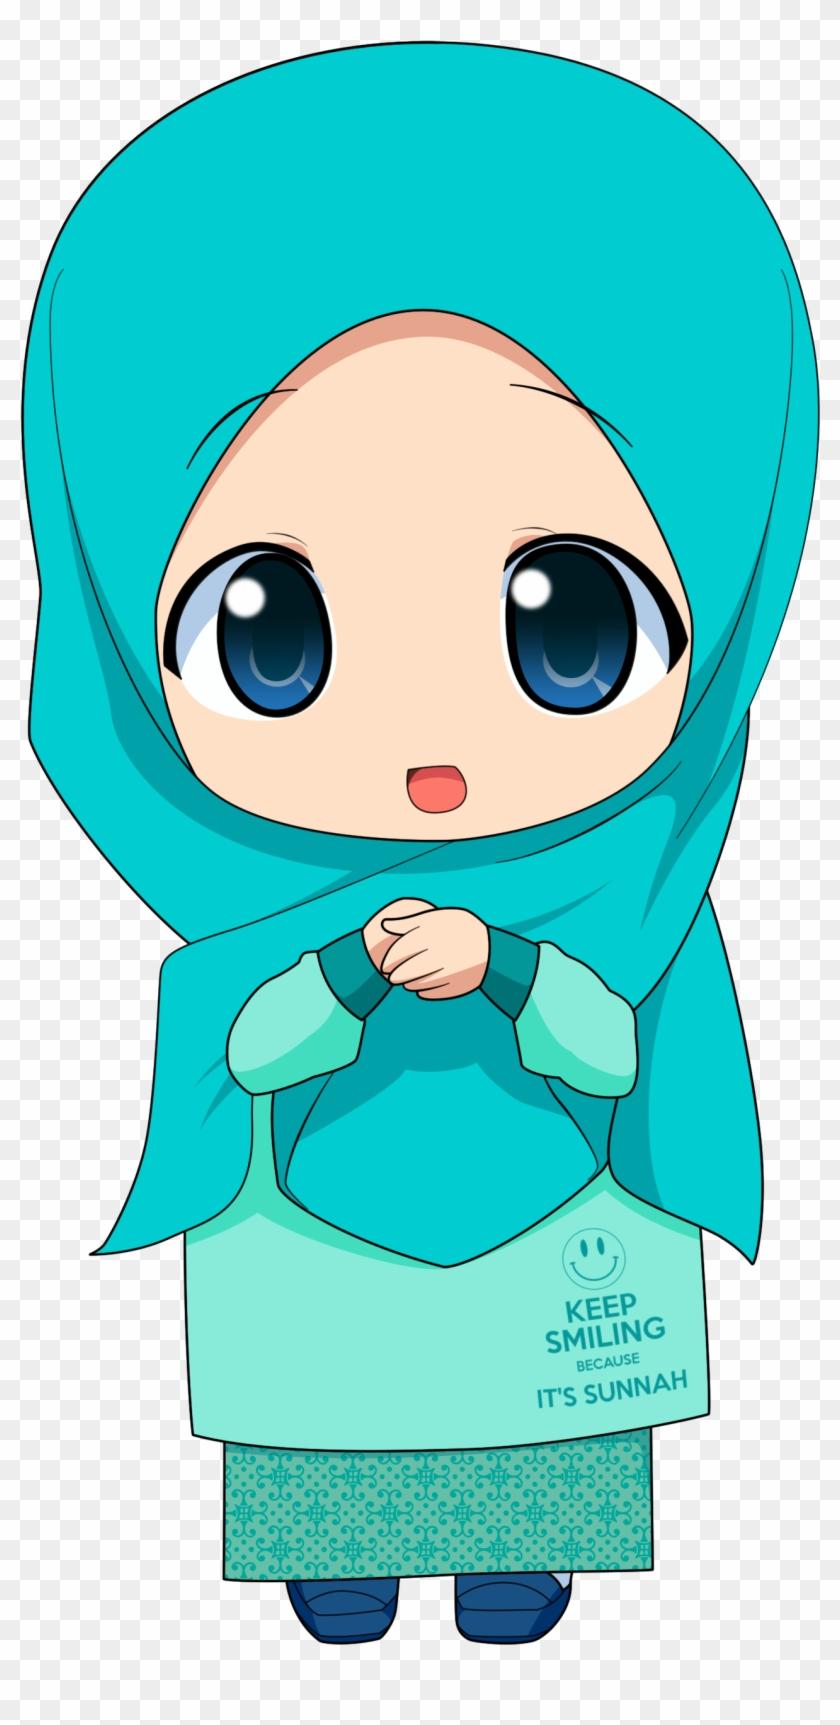 Chibi Muslimah 2 By Taj92 Chibi Muslim Free Transparent